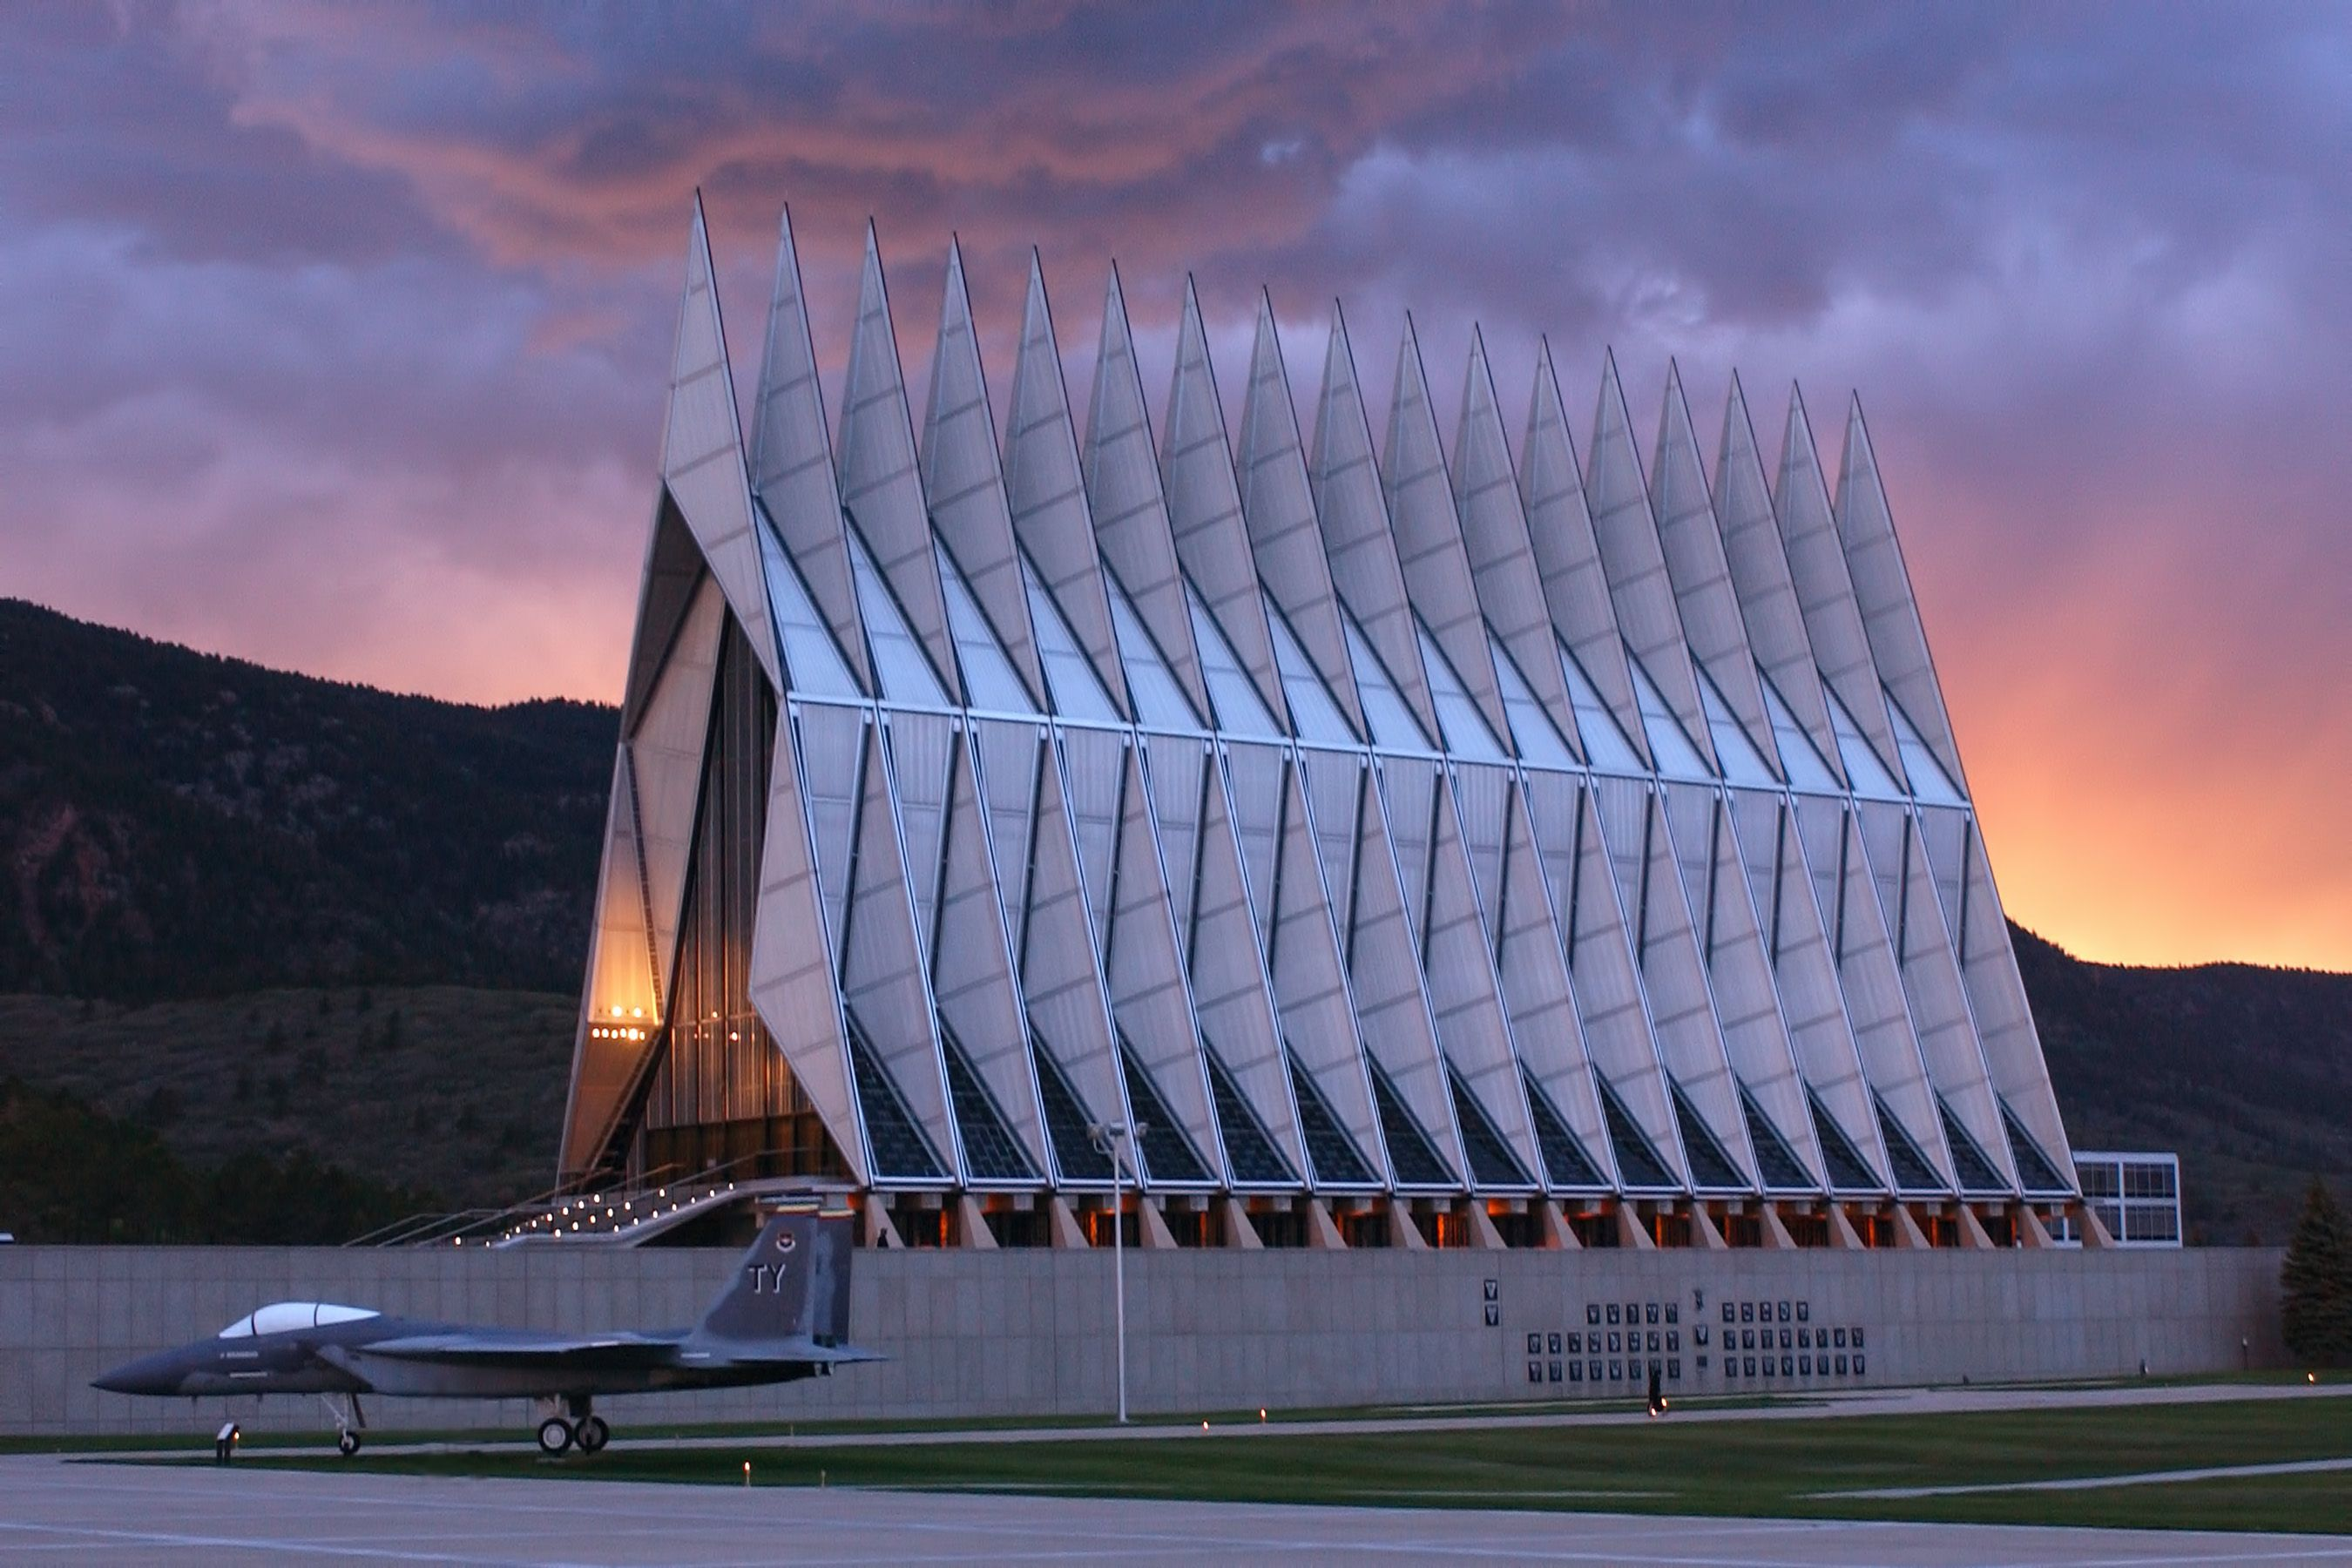 US Air Force Academy Cadet Chapel